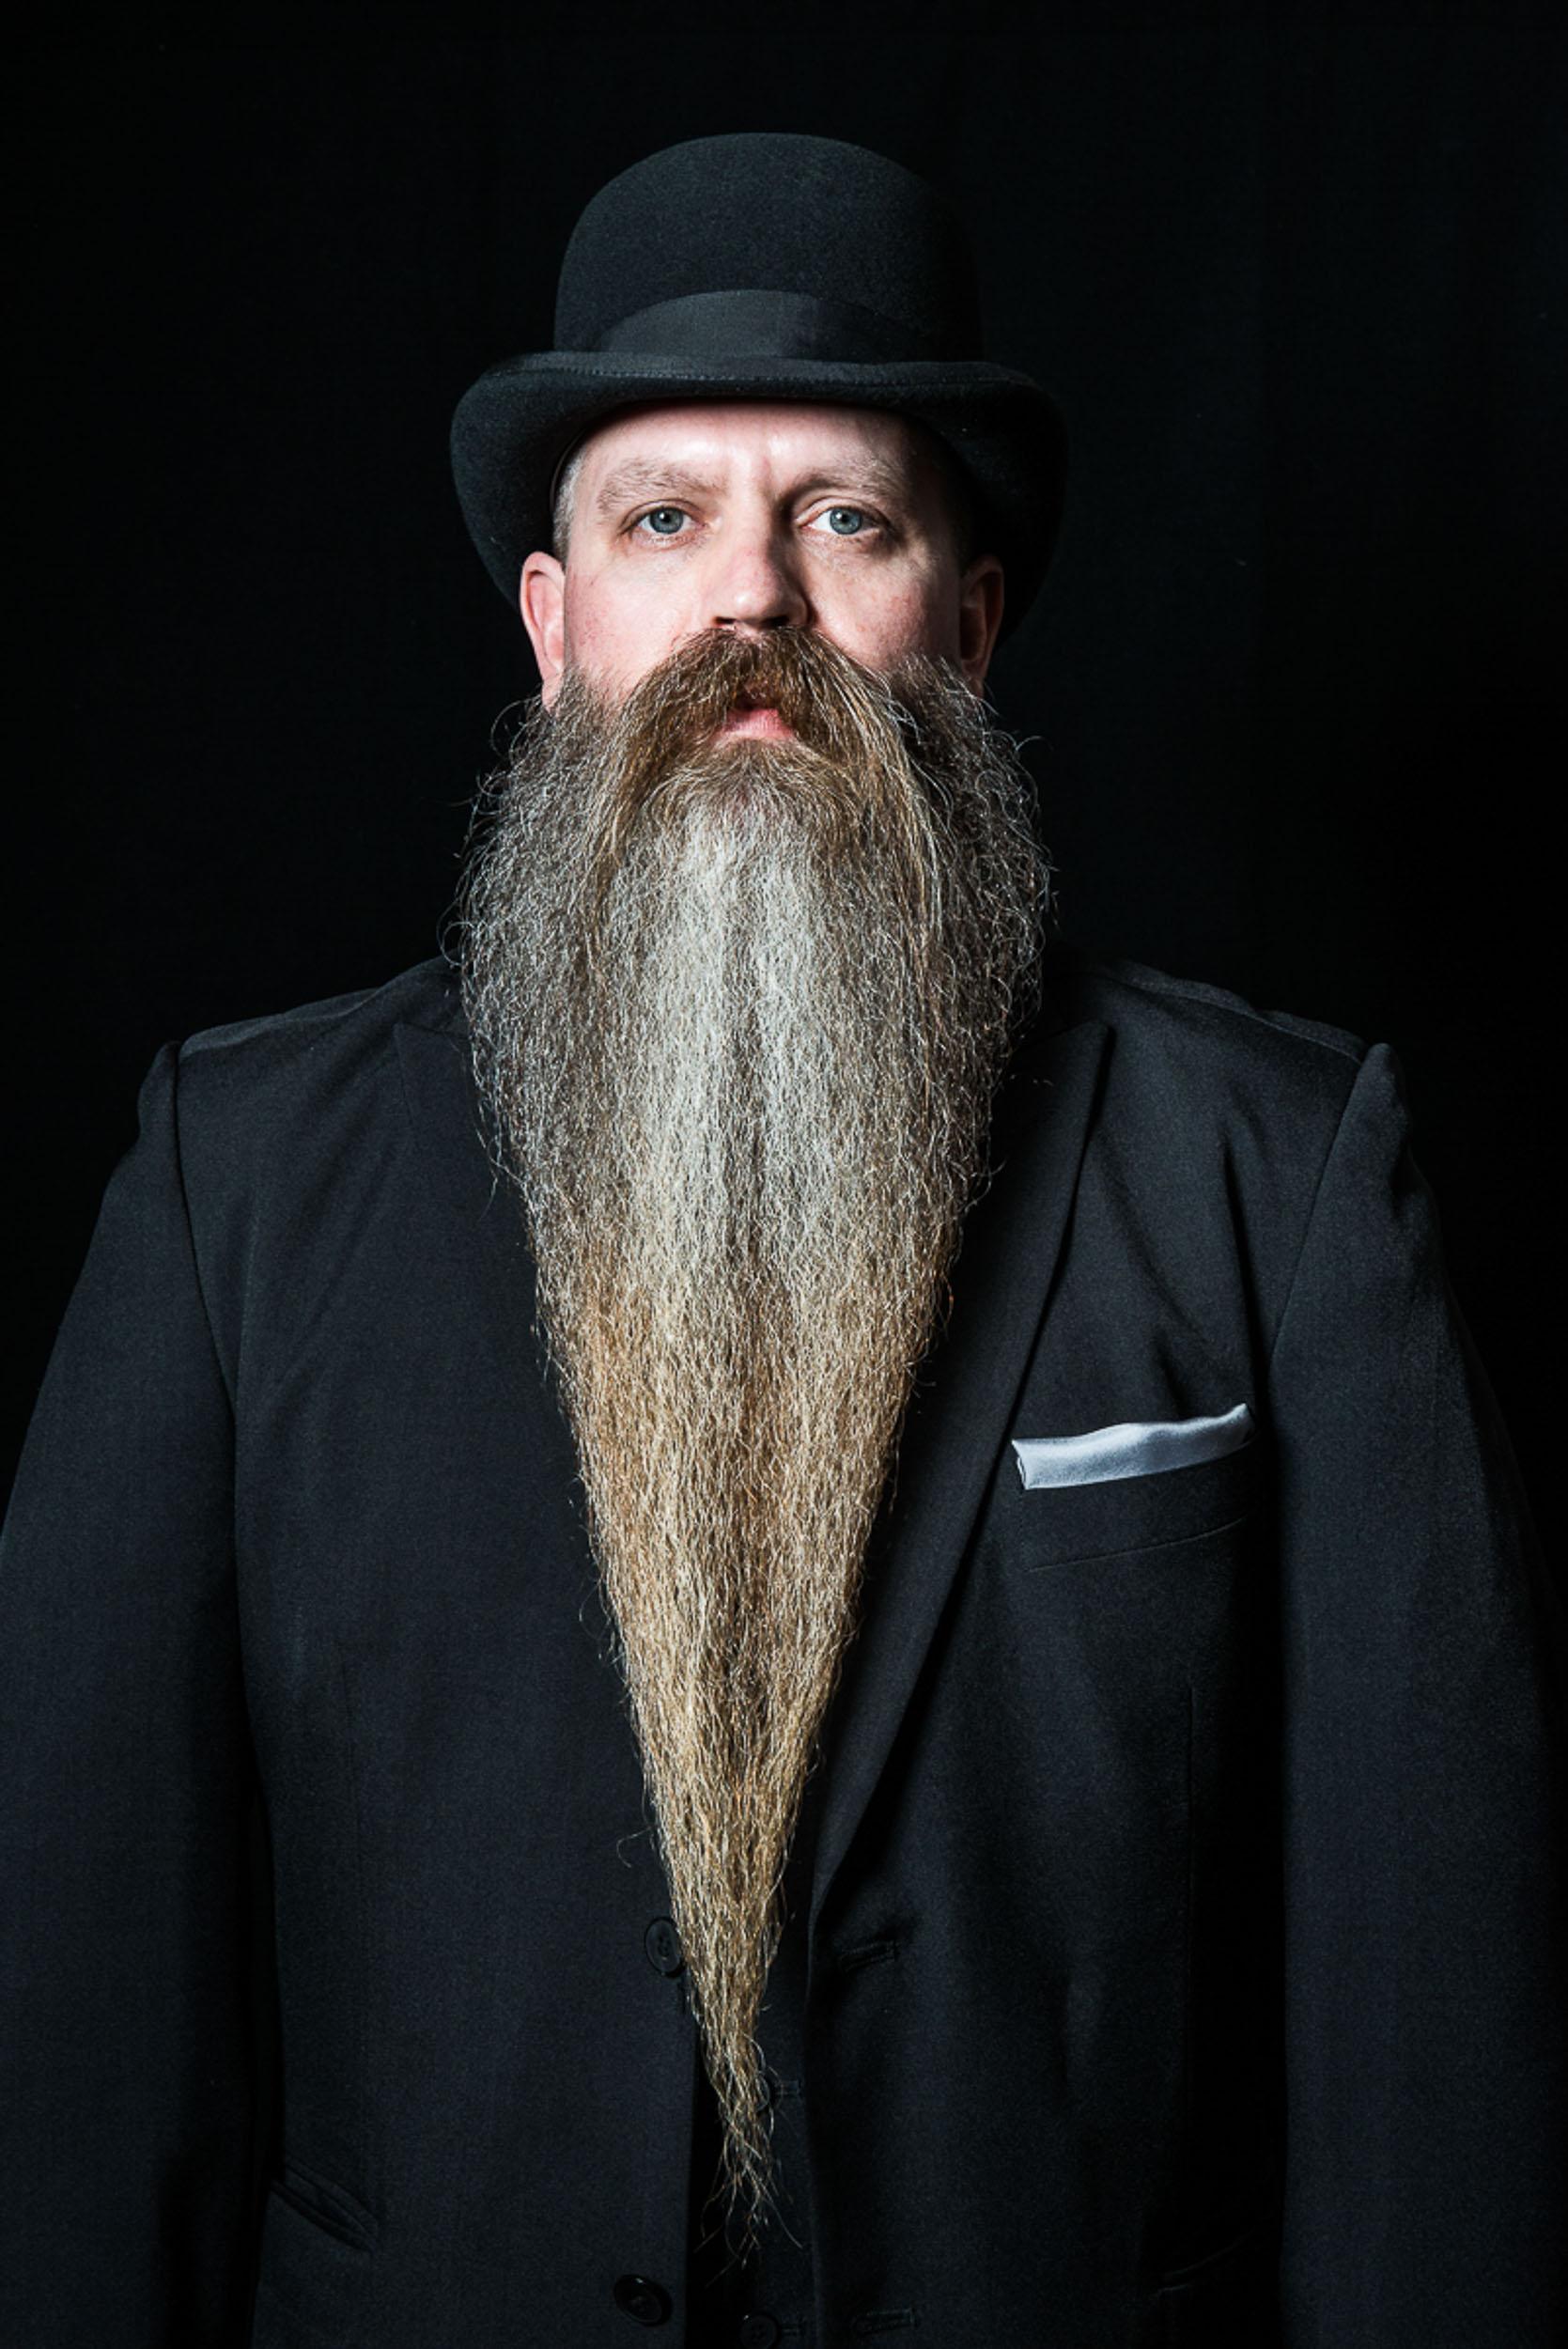 www.iaincrockart.com_Beard-659.jpg